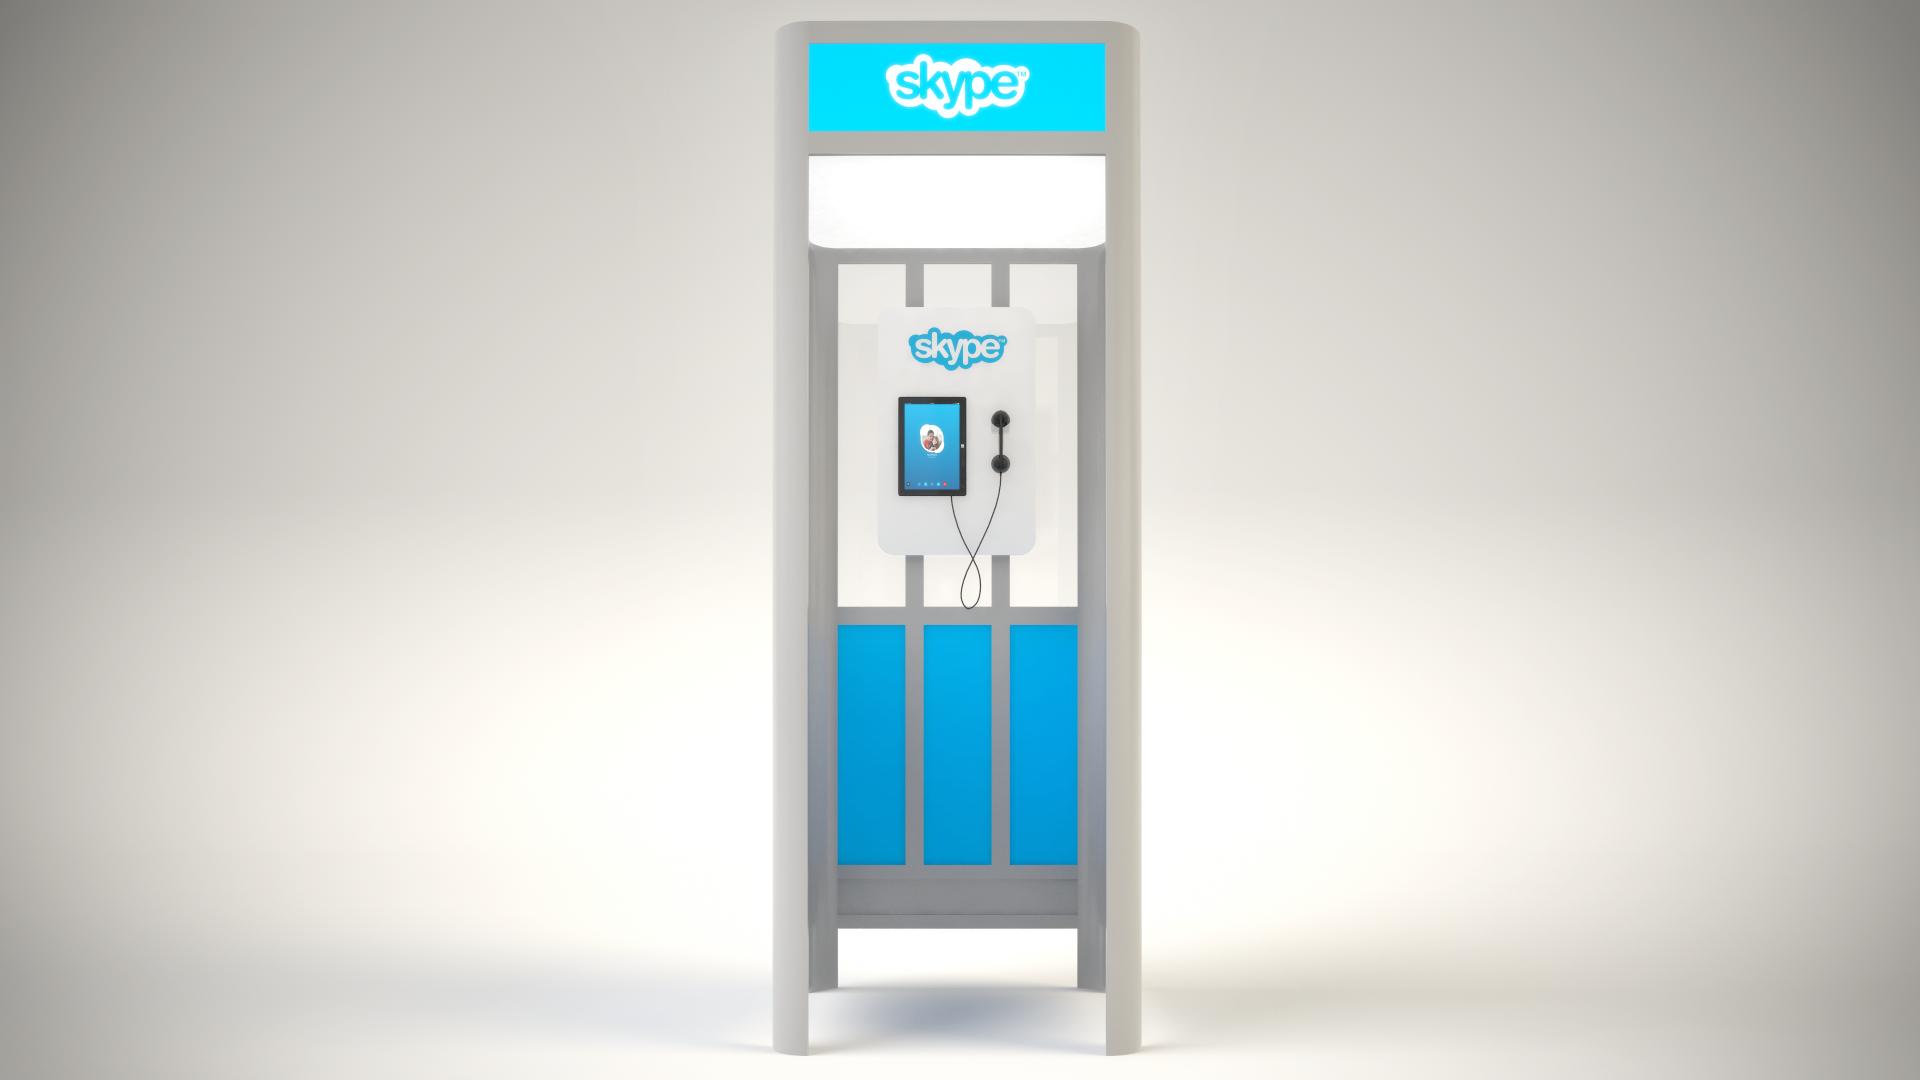 Rental kiosk built from modular Octanorm components & digital graphics